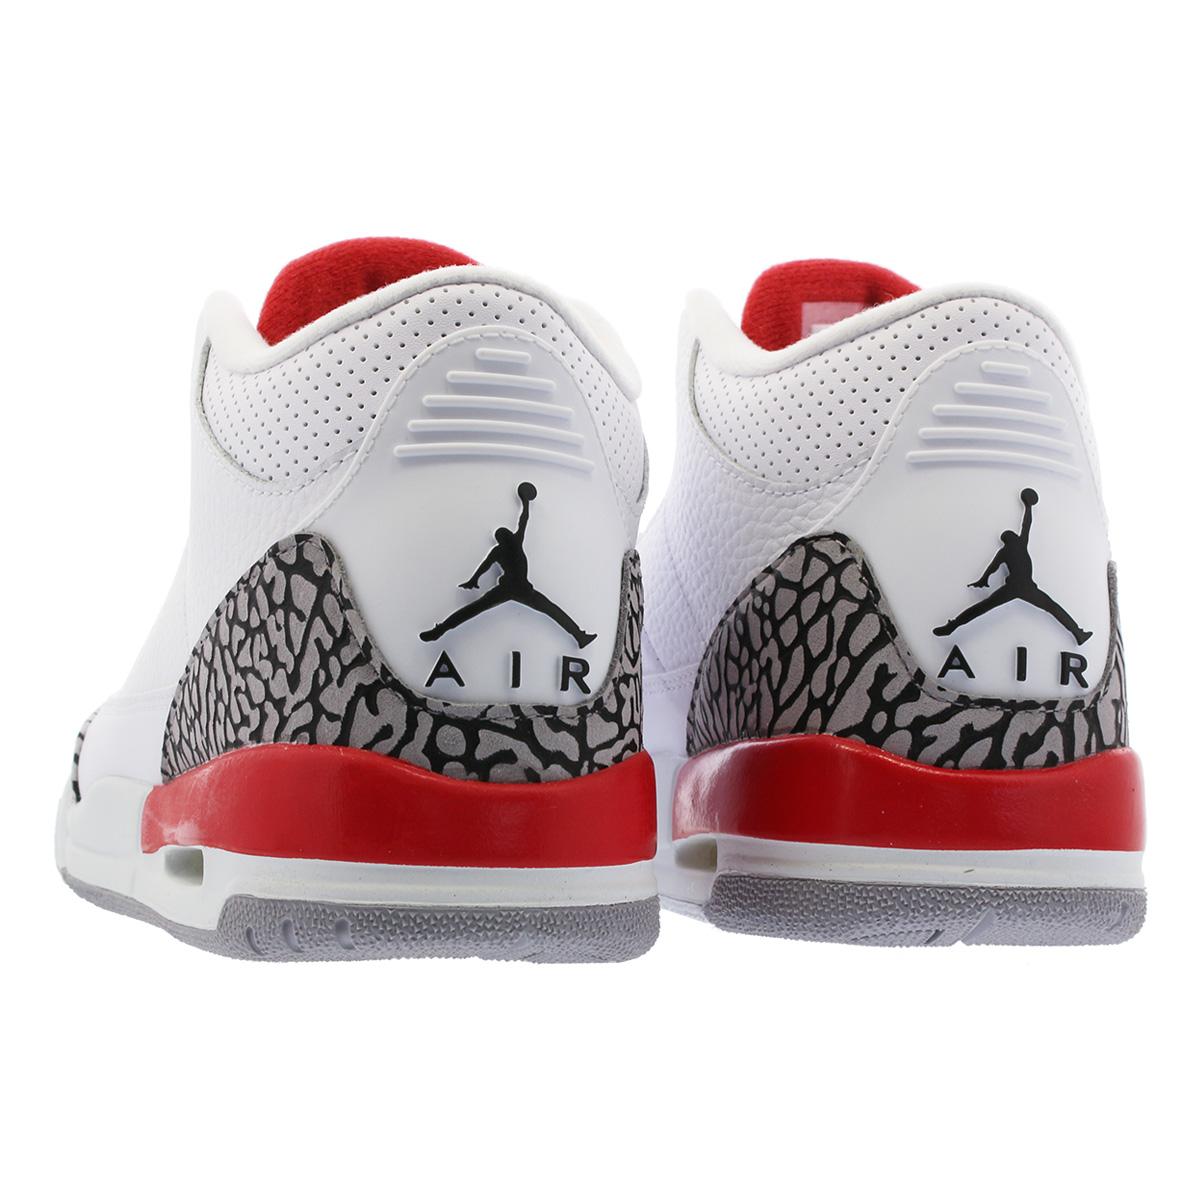 1b61d81df510b3 NIKE AIR JORDAN 3 RETRO BG Nike Air Jordan 3 nostalgic BG WHITE CEMENT GREY FIRE  RED 398